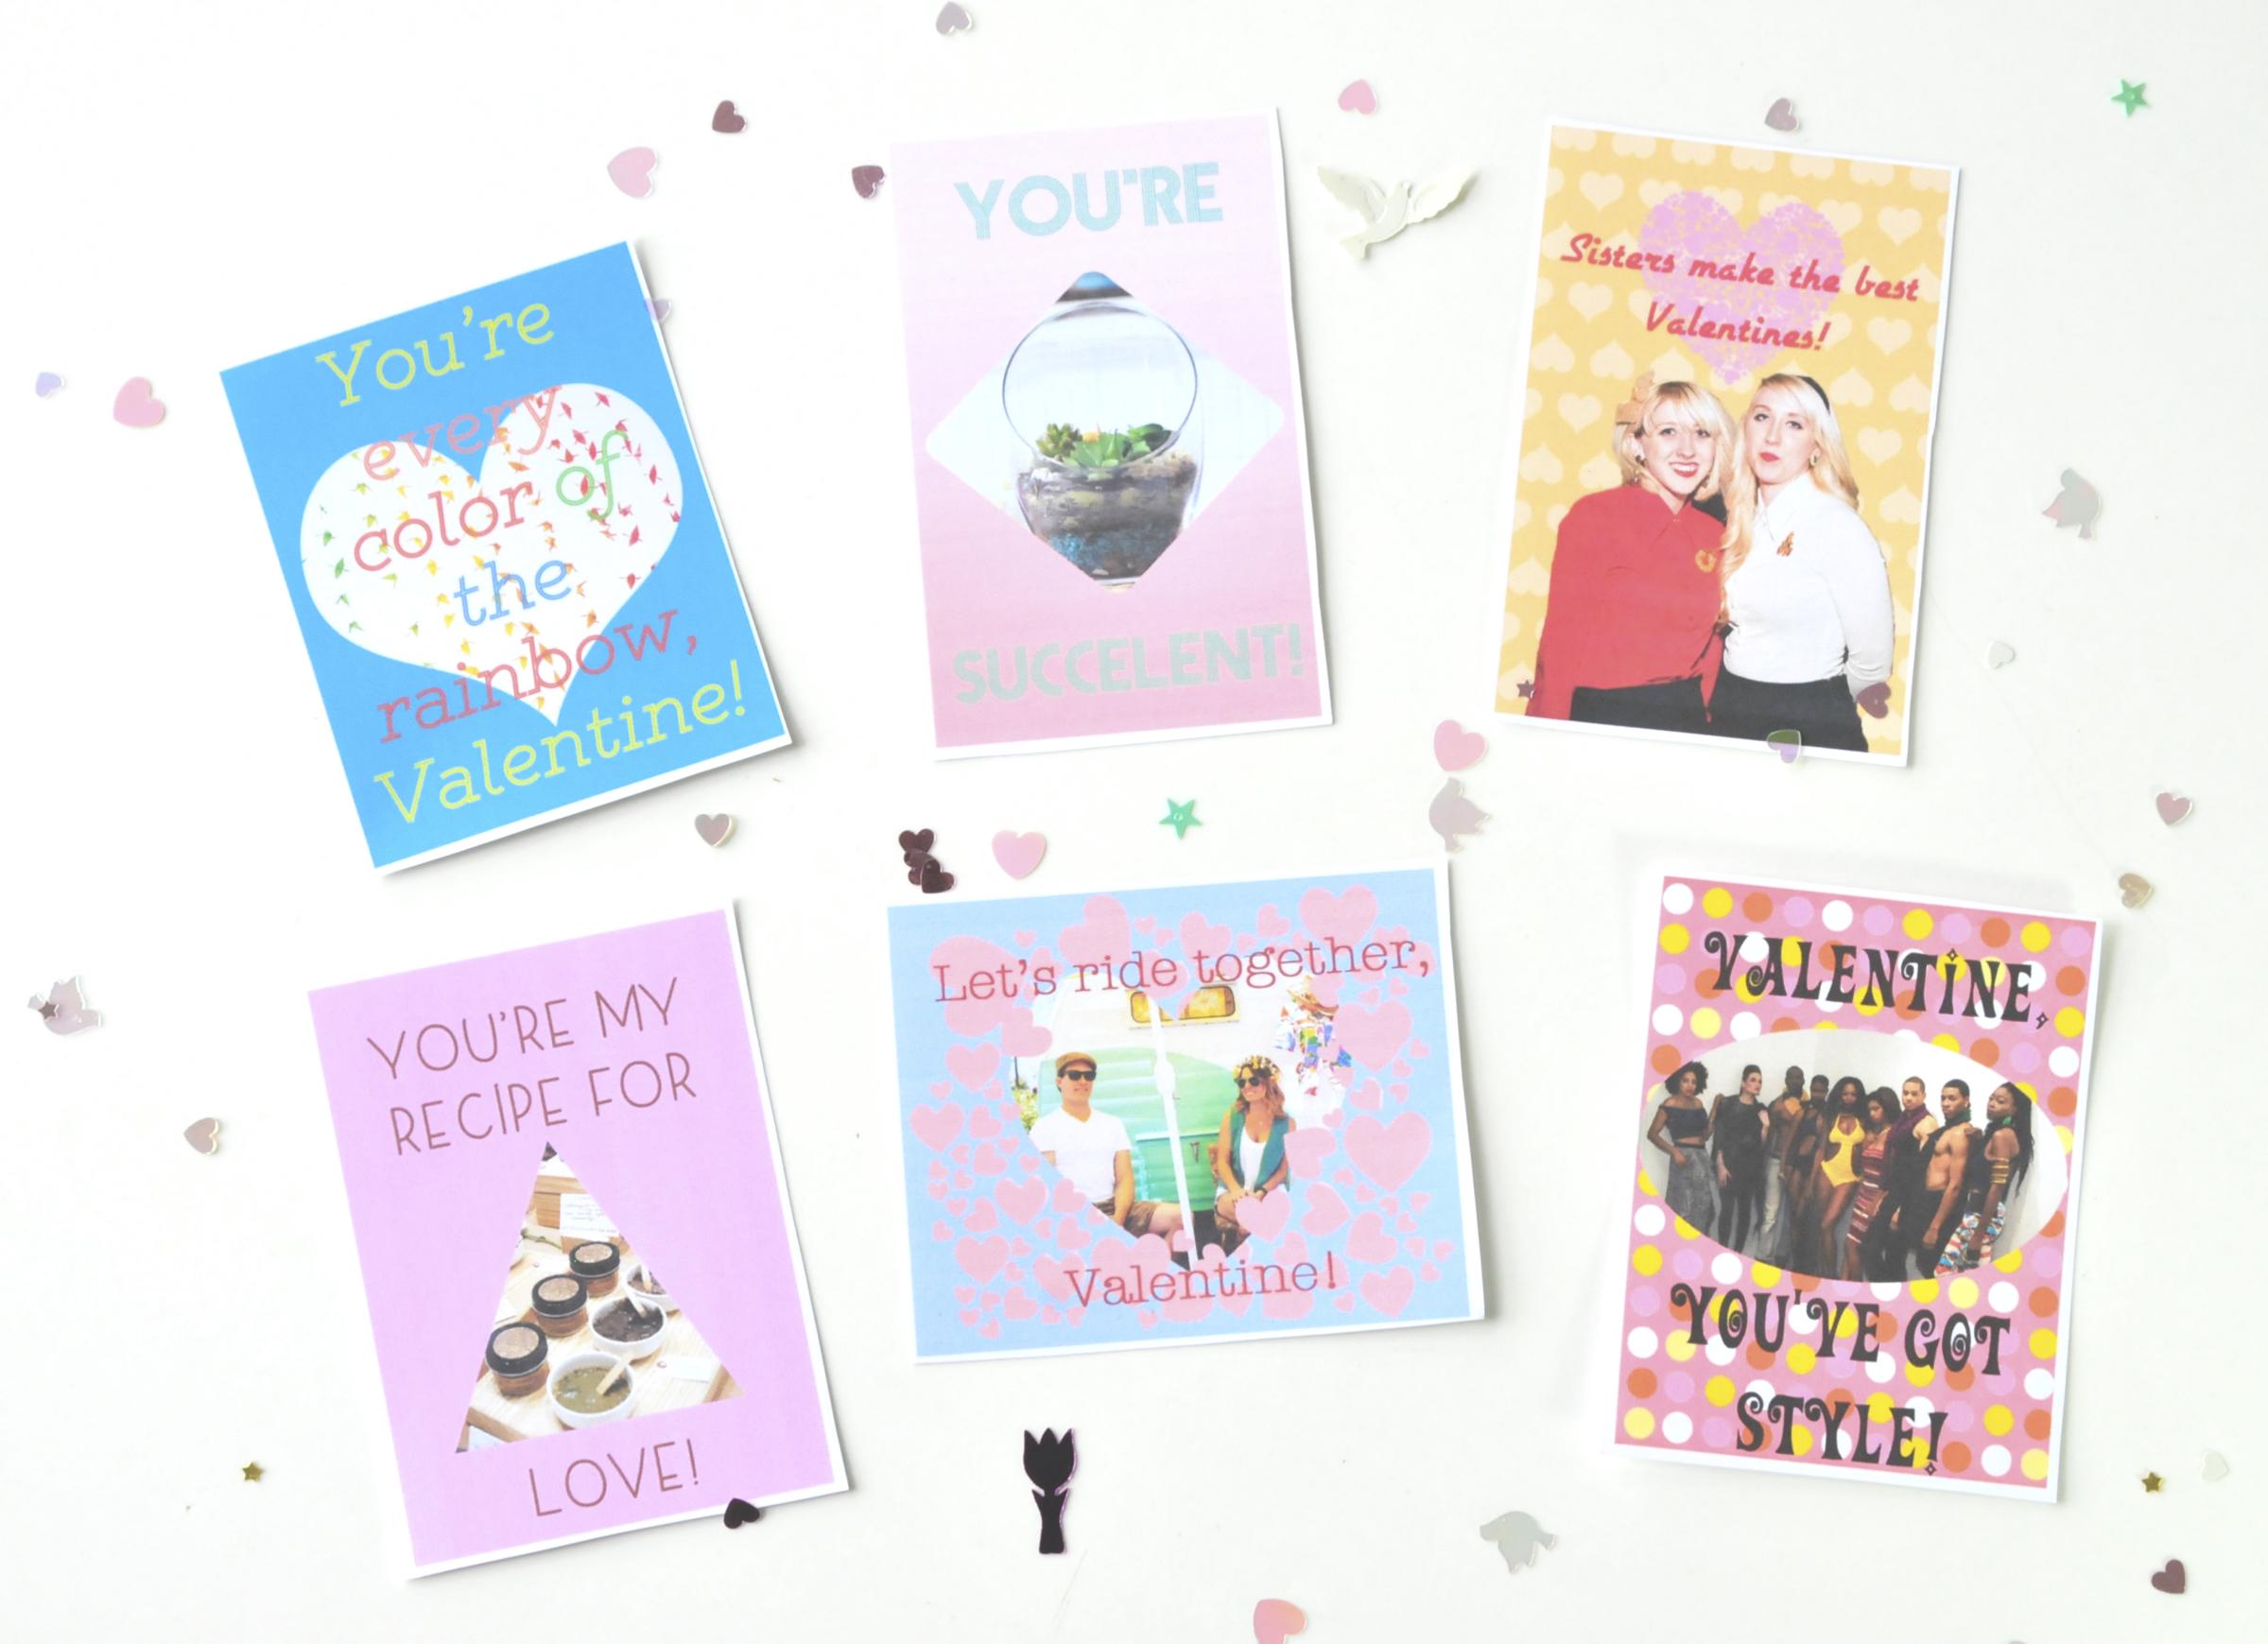 Printable Valentines Craft Valentines by Pop Shop America DIY Festival Free Printables